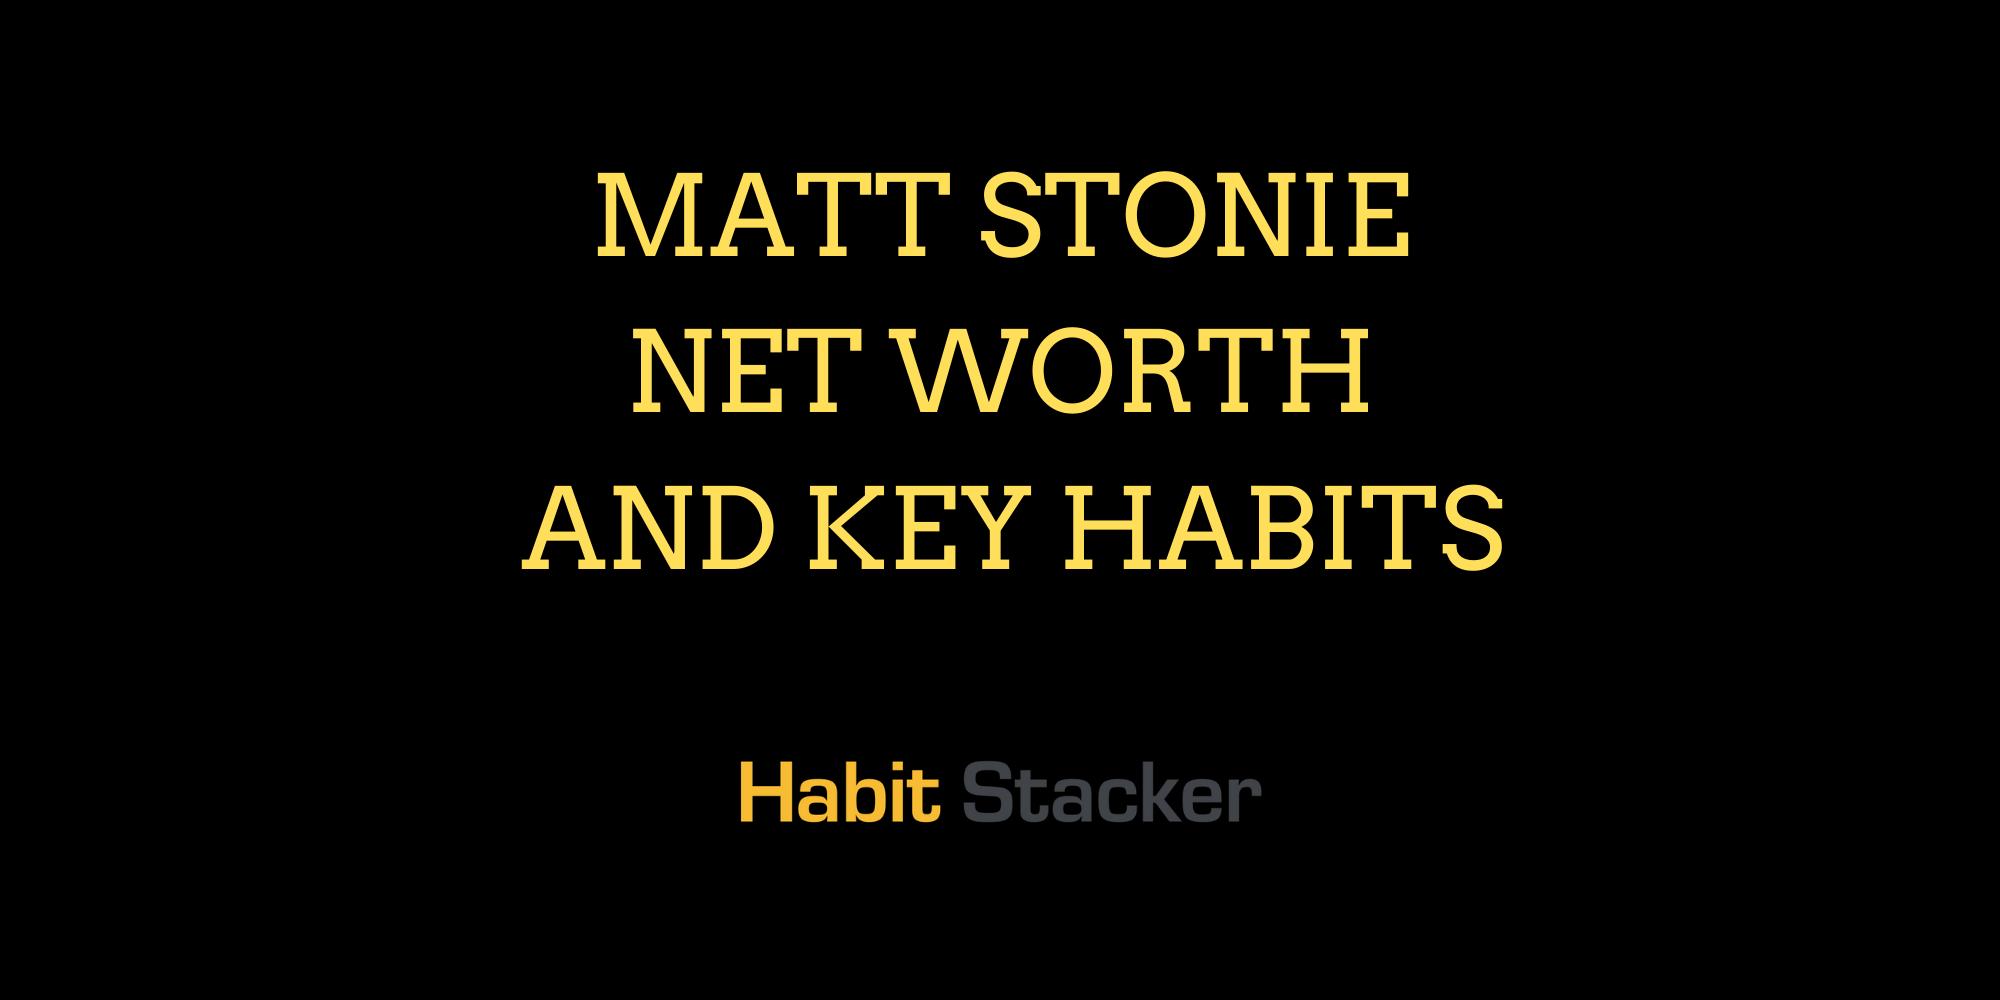 Matt Stonie Net Worth and Key Habits